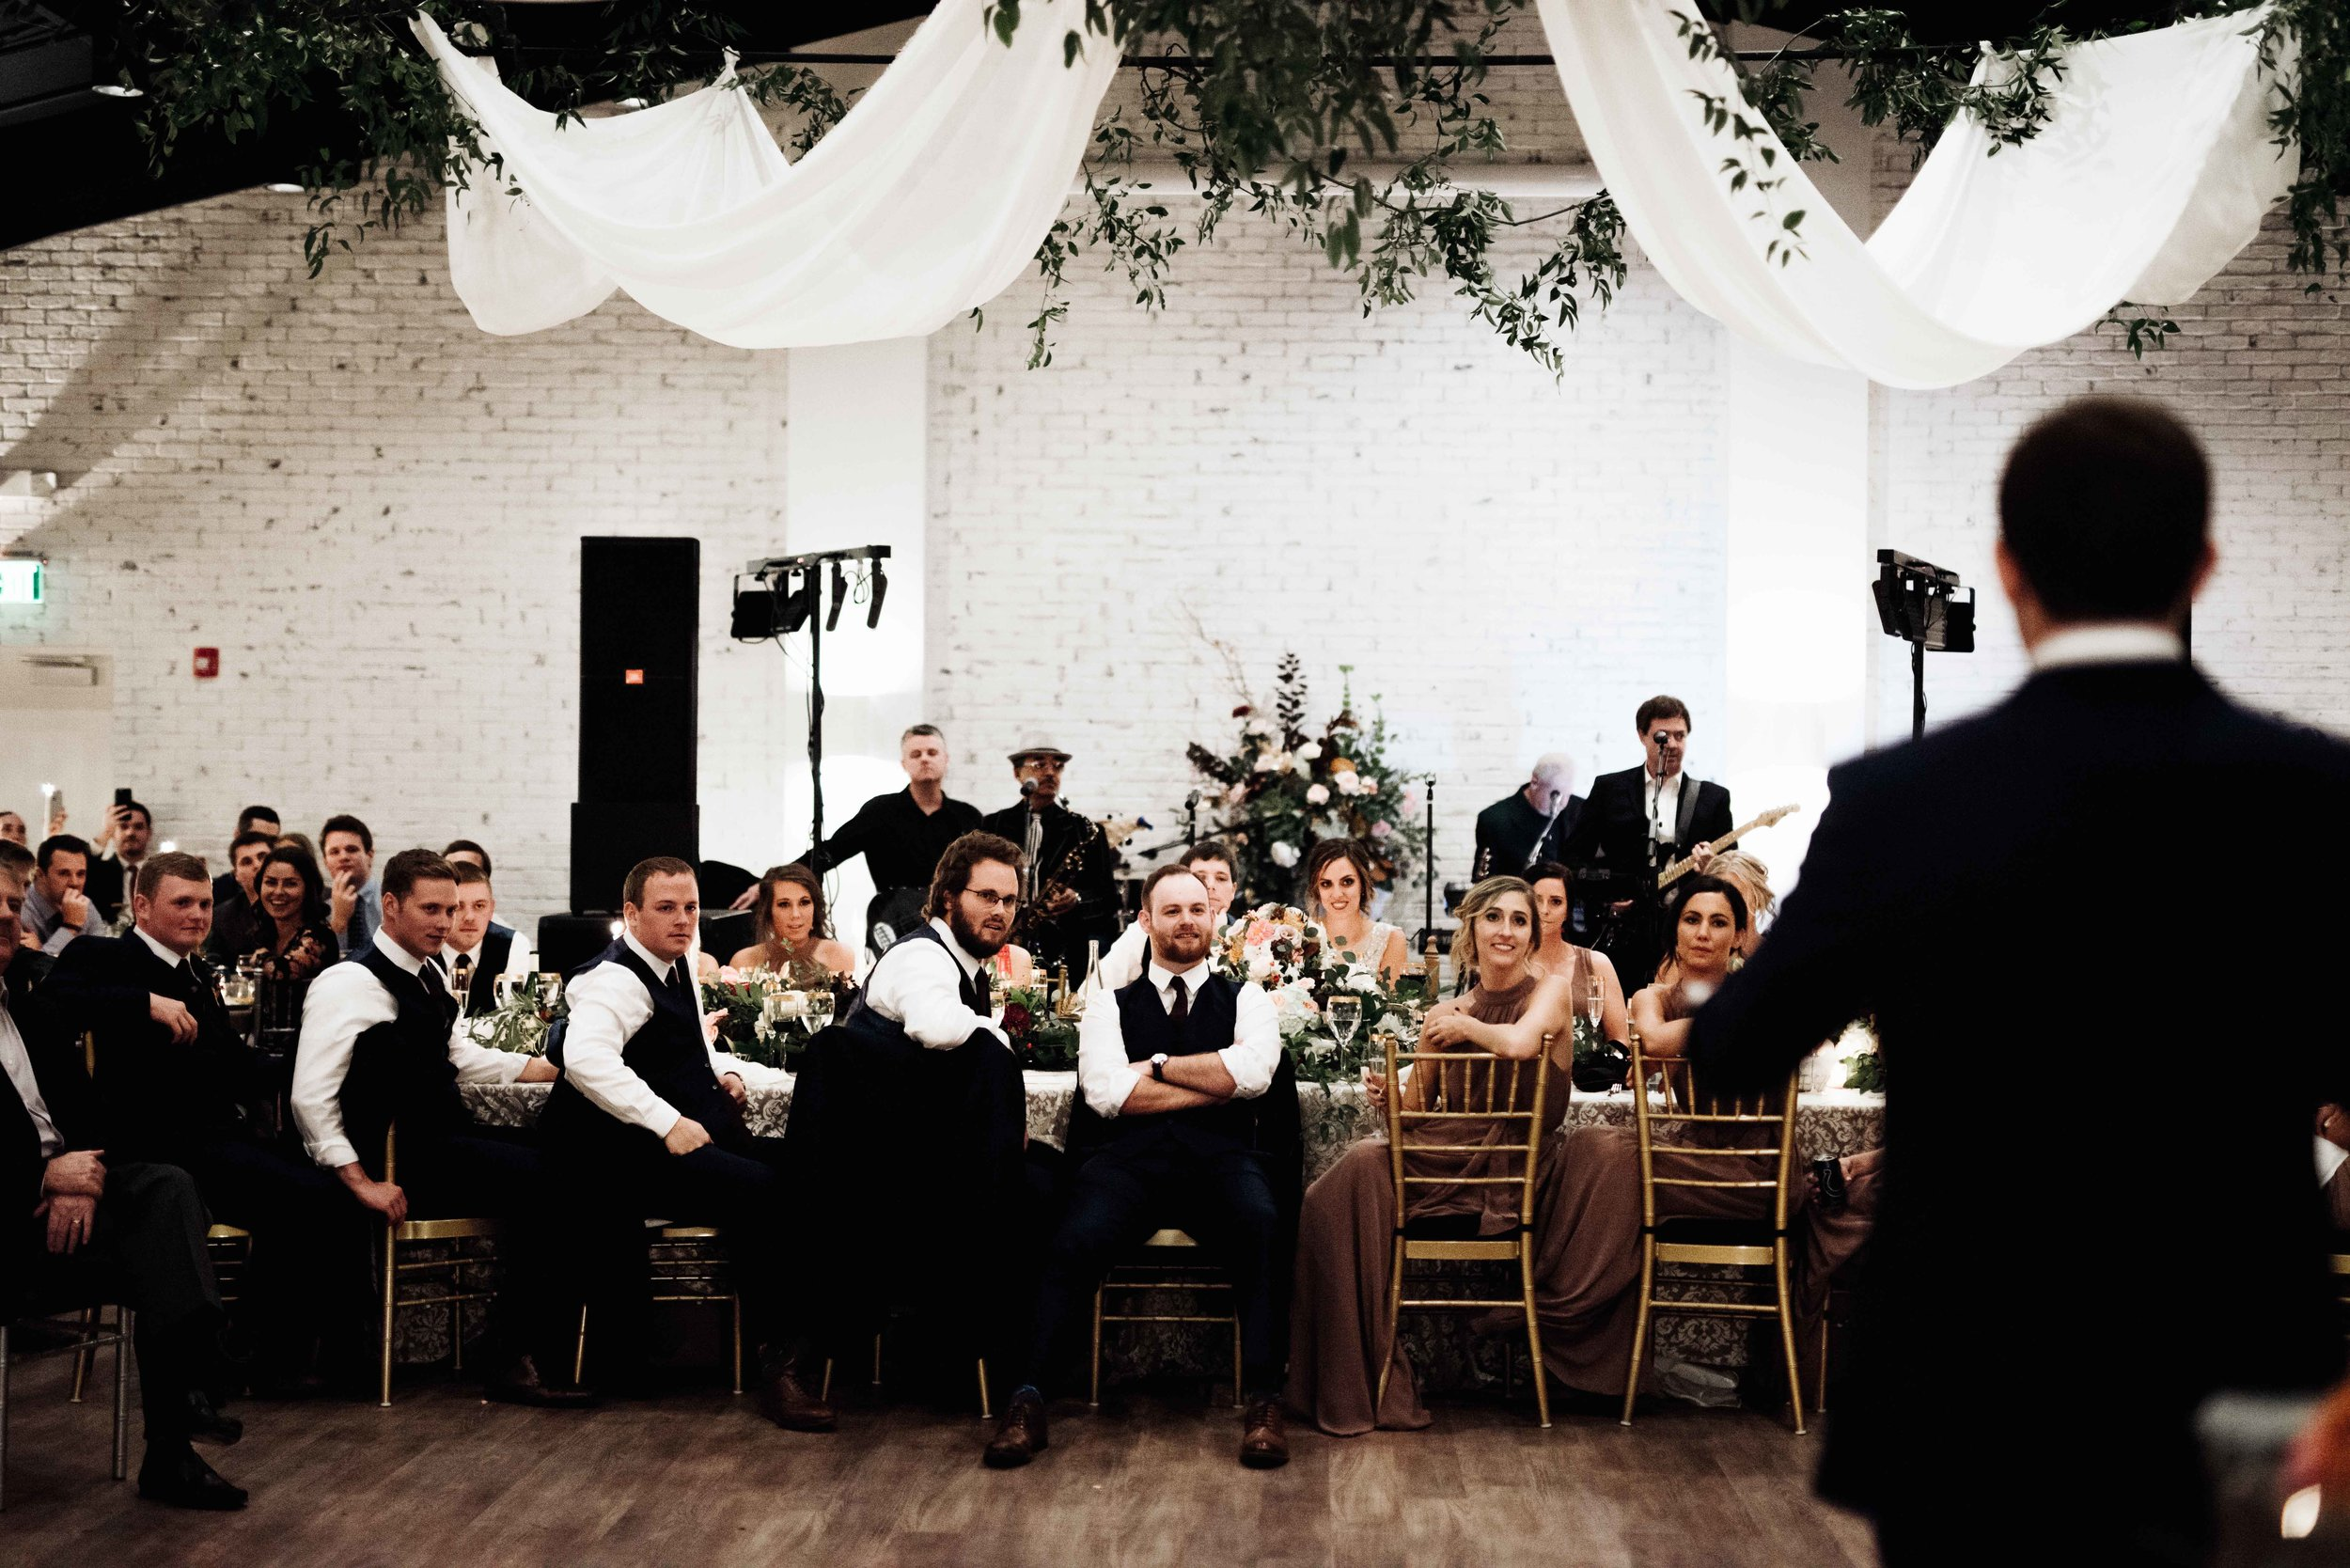 Carlee-Bob-Indianapolis-Wedding-Blog-100.jpg